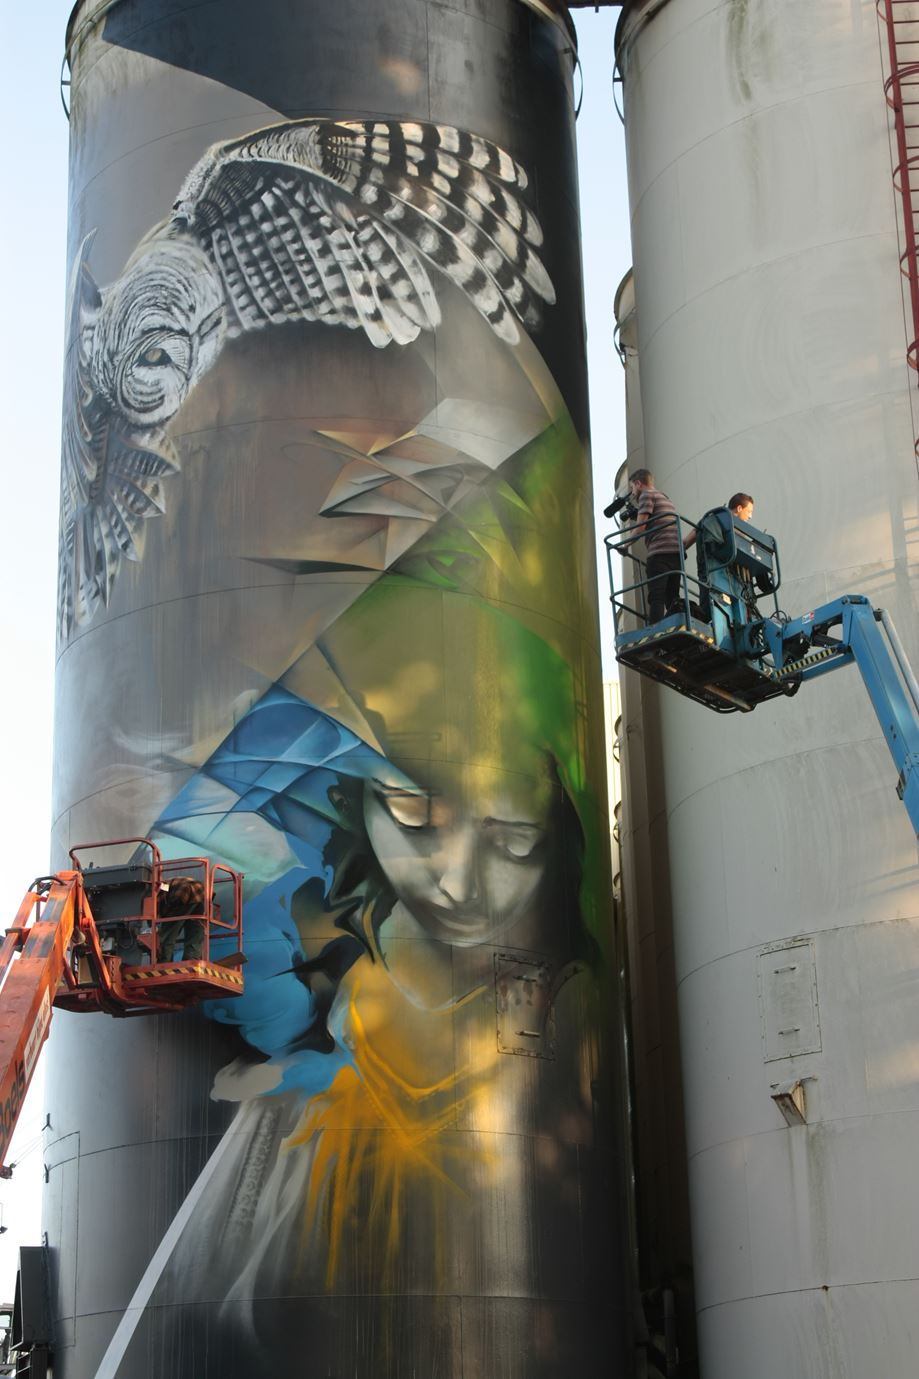 Kings of color graffiti festival